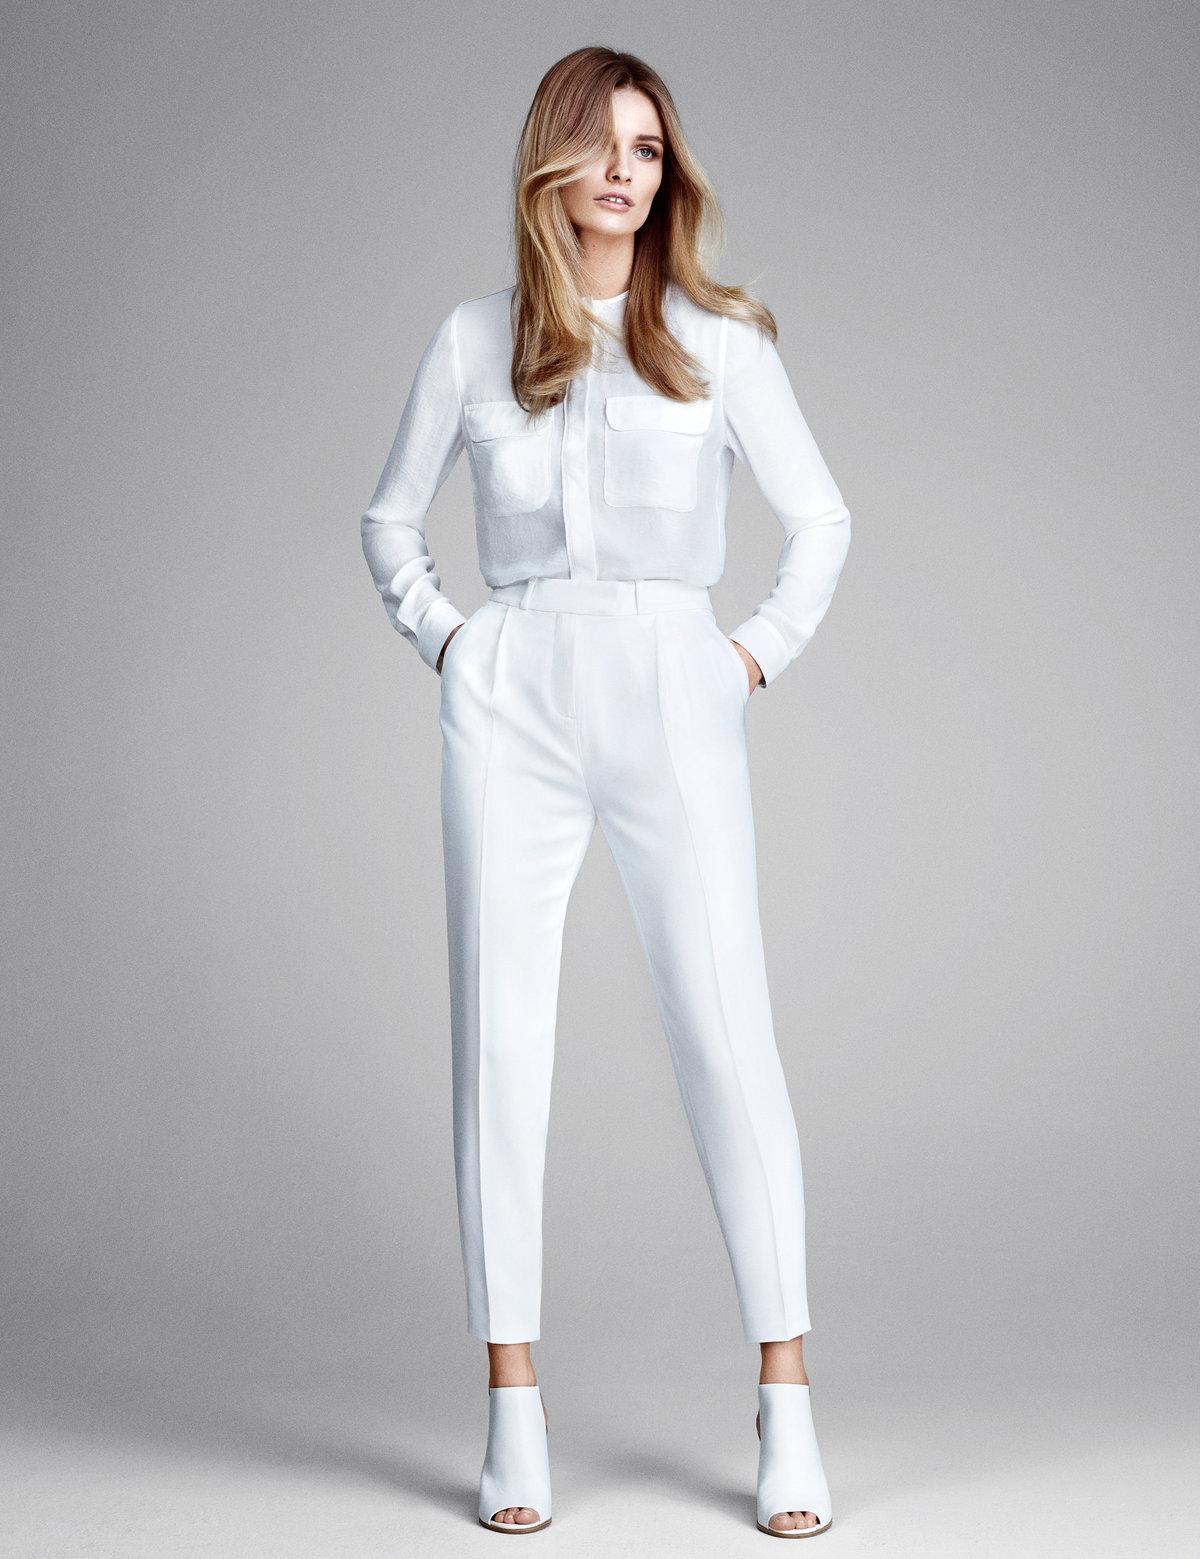 один женские белые брюки картинки сети нетрудно найти